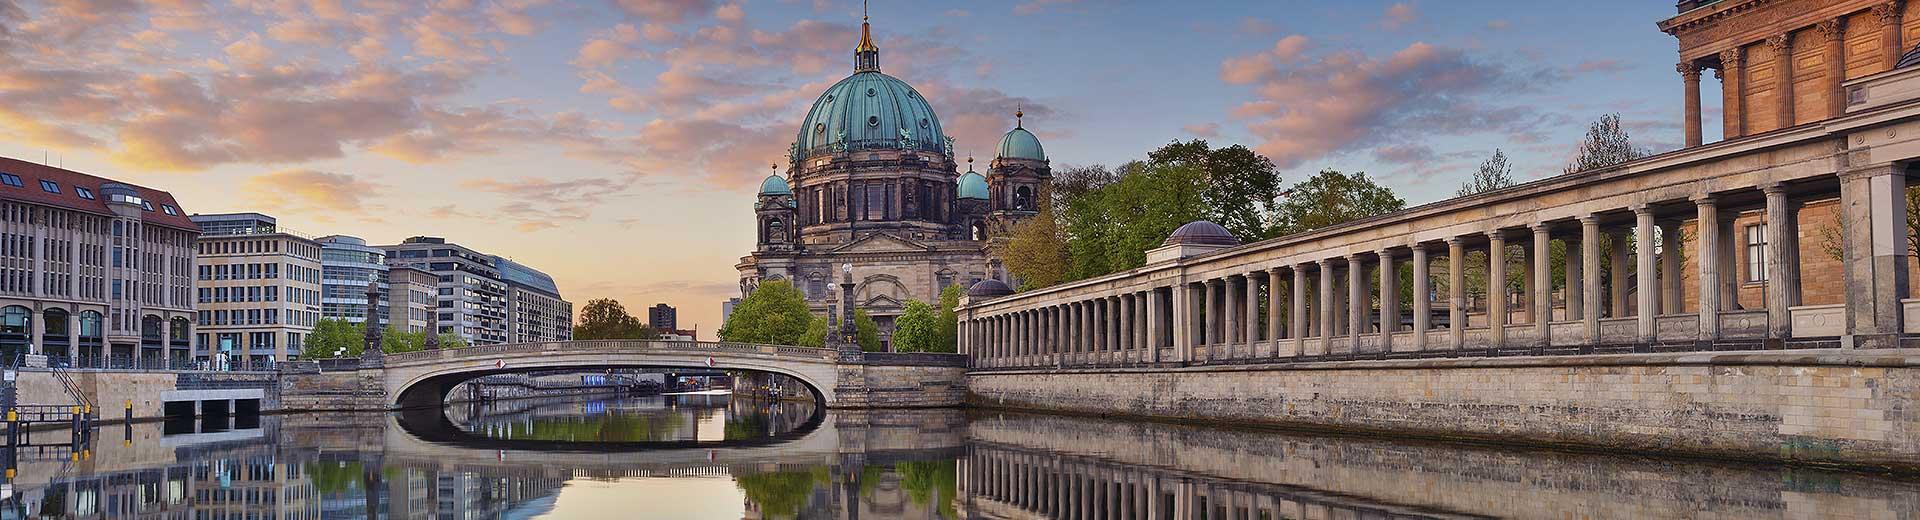 Gruppenreise Berlin - Package Gruppen Classic Flug